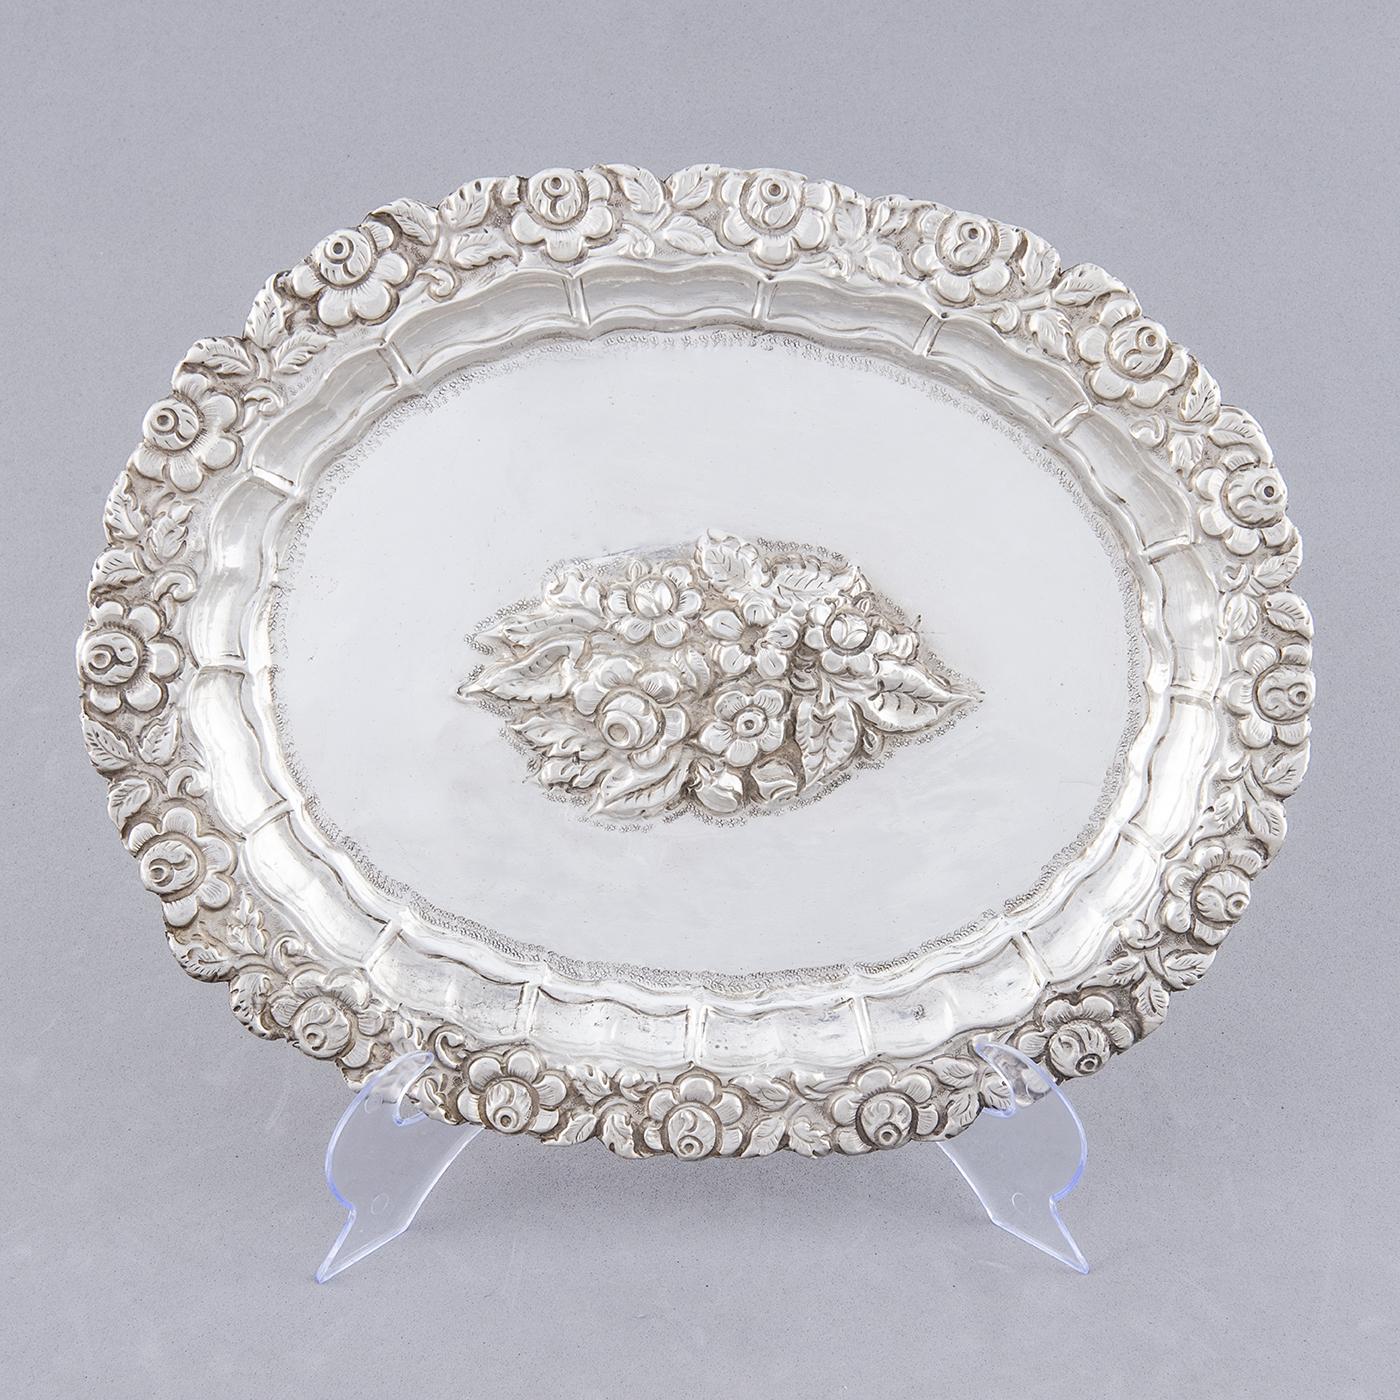 Bandeja Decorativa Oval en plata. España, siglo XIX.